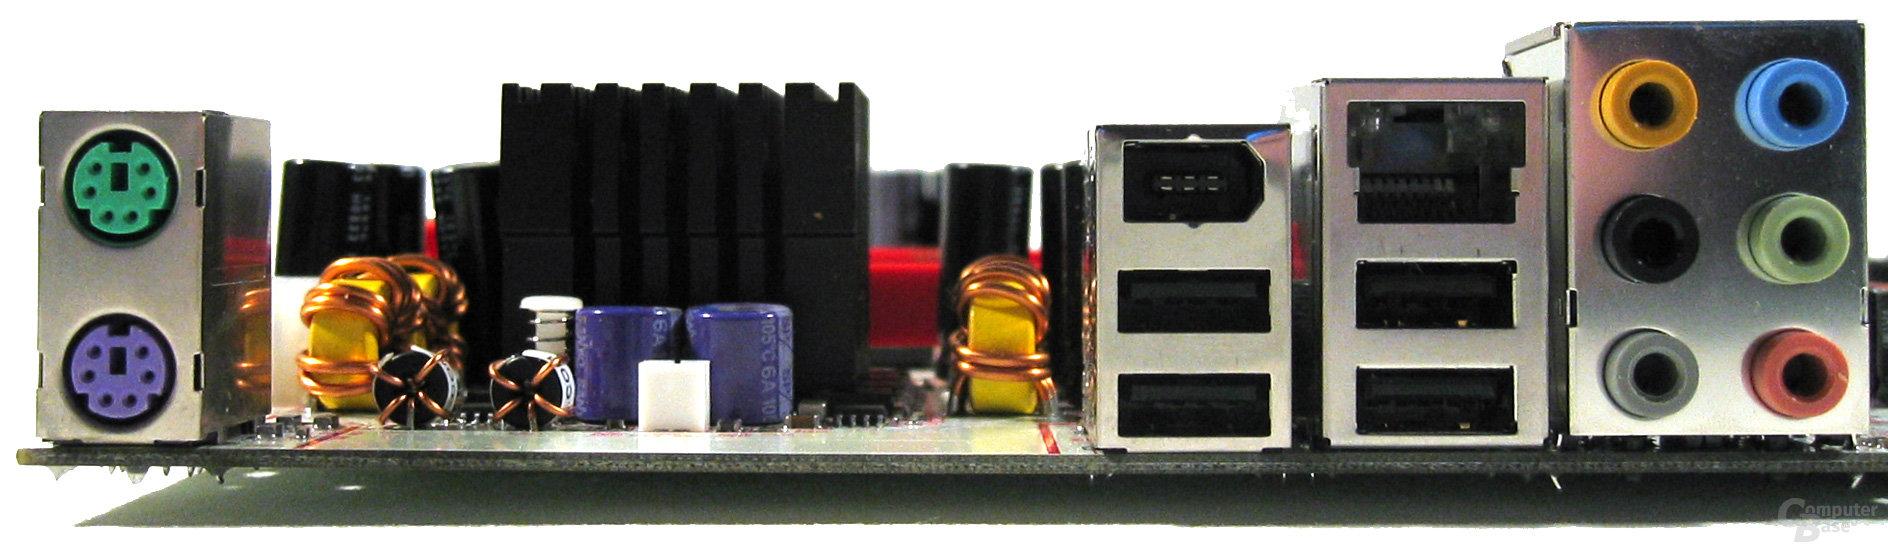 PC-A9RD480 ATX-Blende